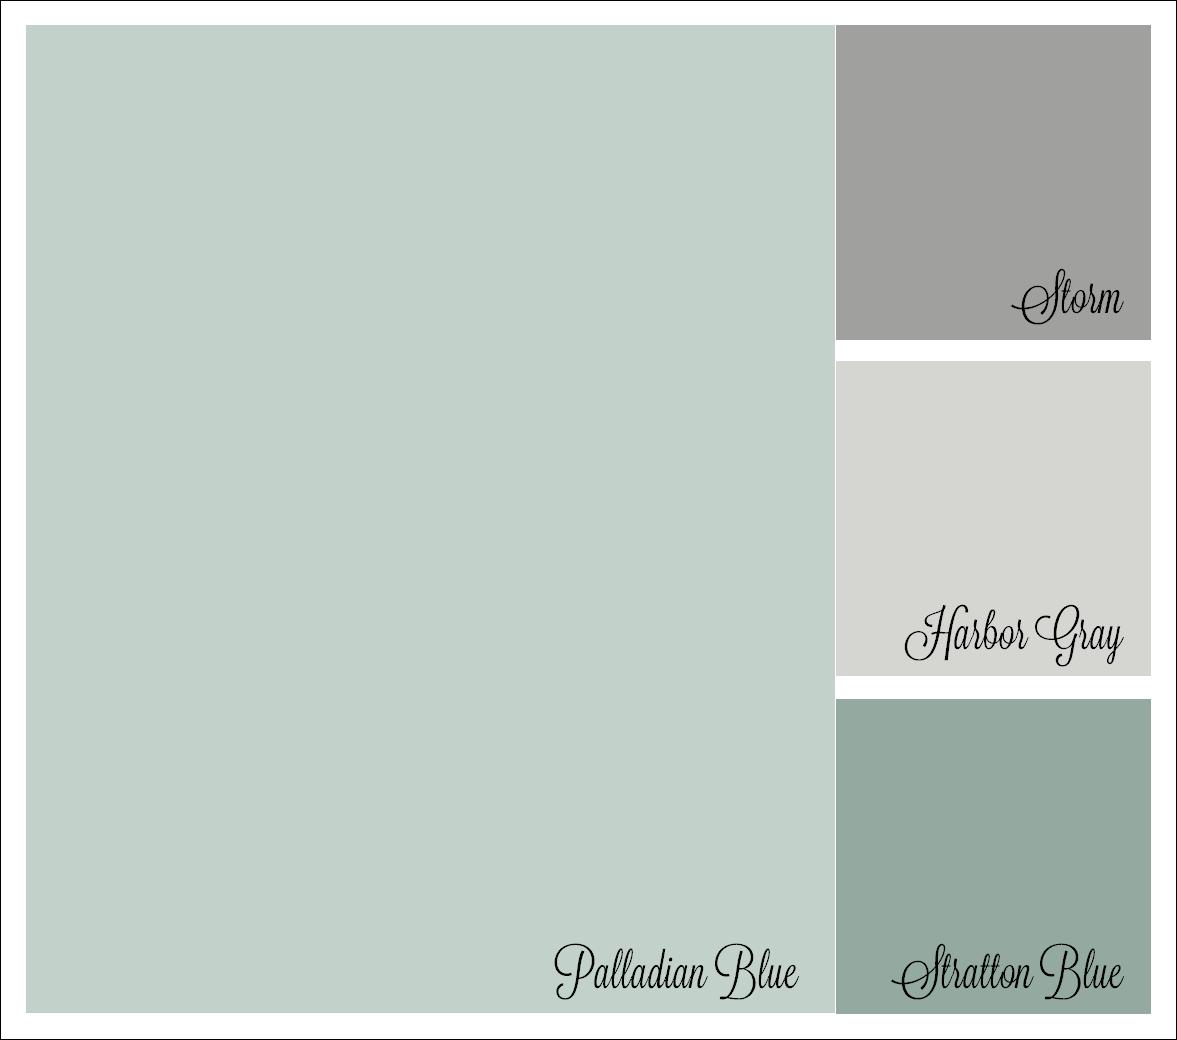 Color Palette Benjamin Moore Palladian Blue Storm Harboy Gray Stratton Blue Paint Colors